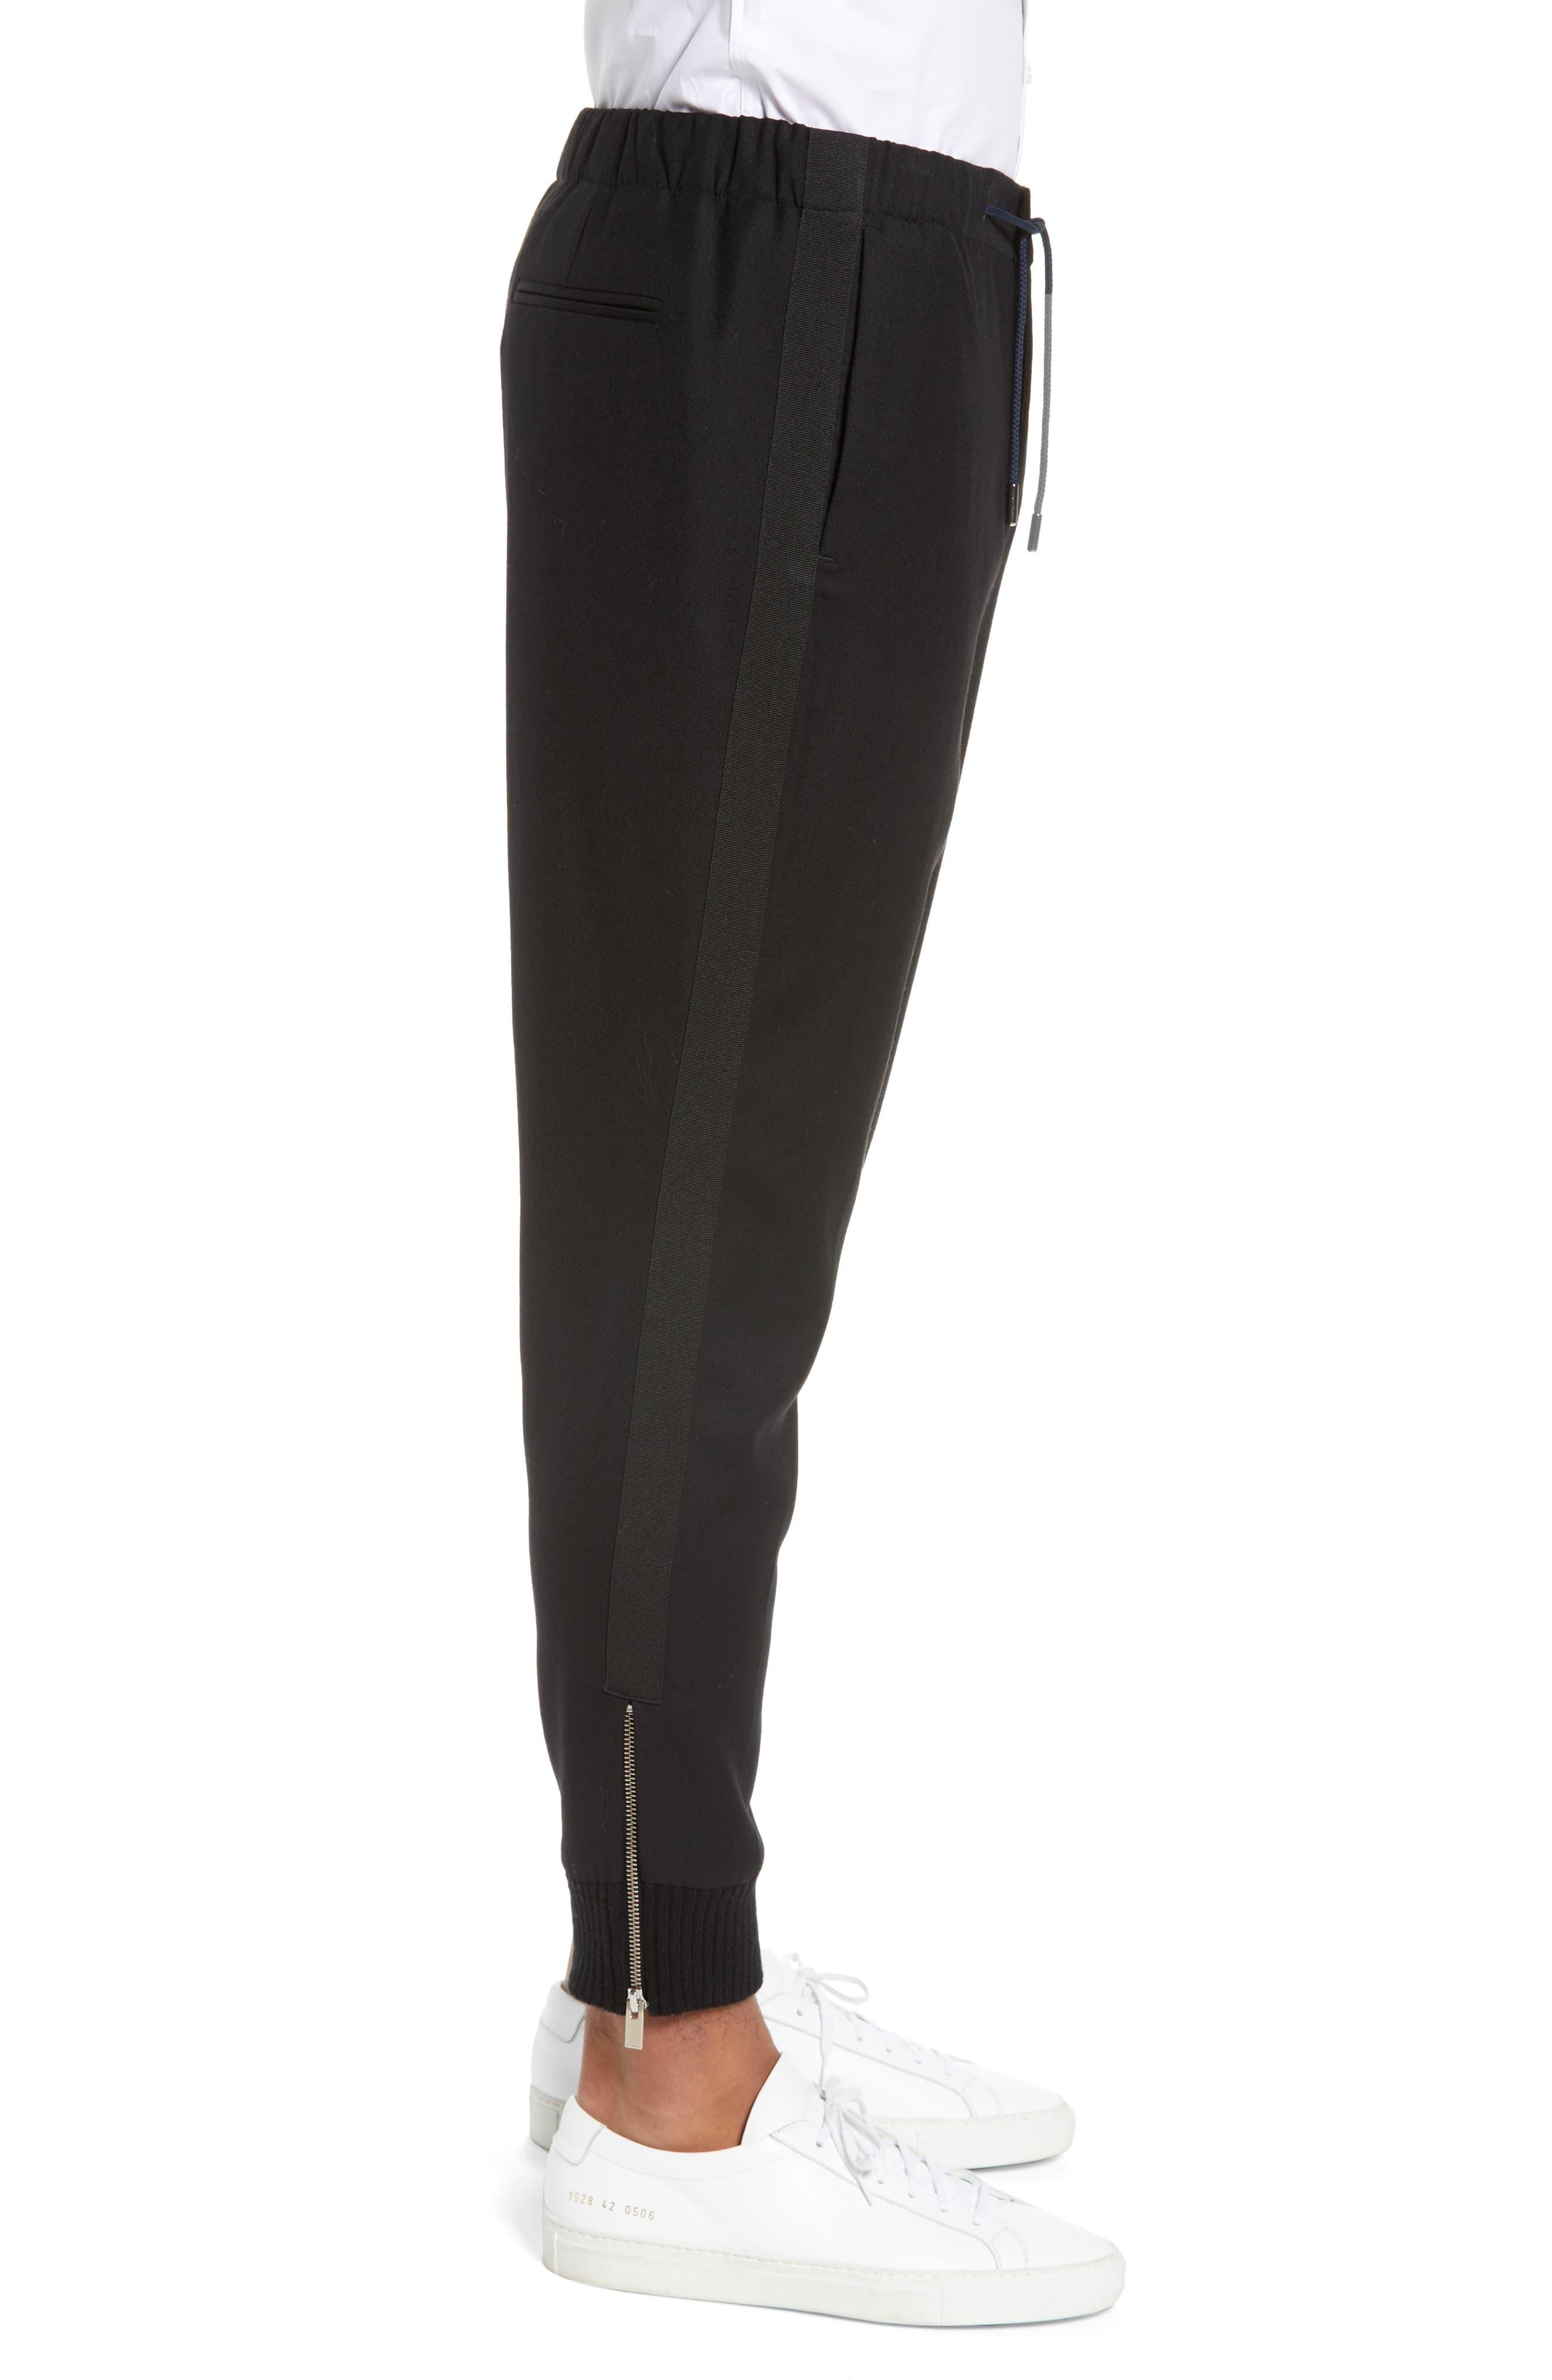 THE KOOPLES, Straight Leg Woven Jogger Pants, Alternate thumbnail 4, color, BLACK